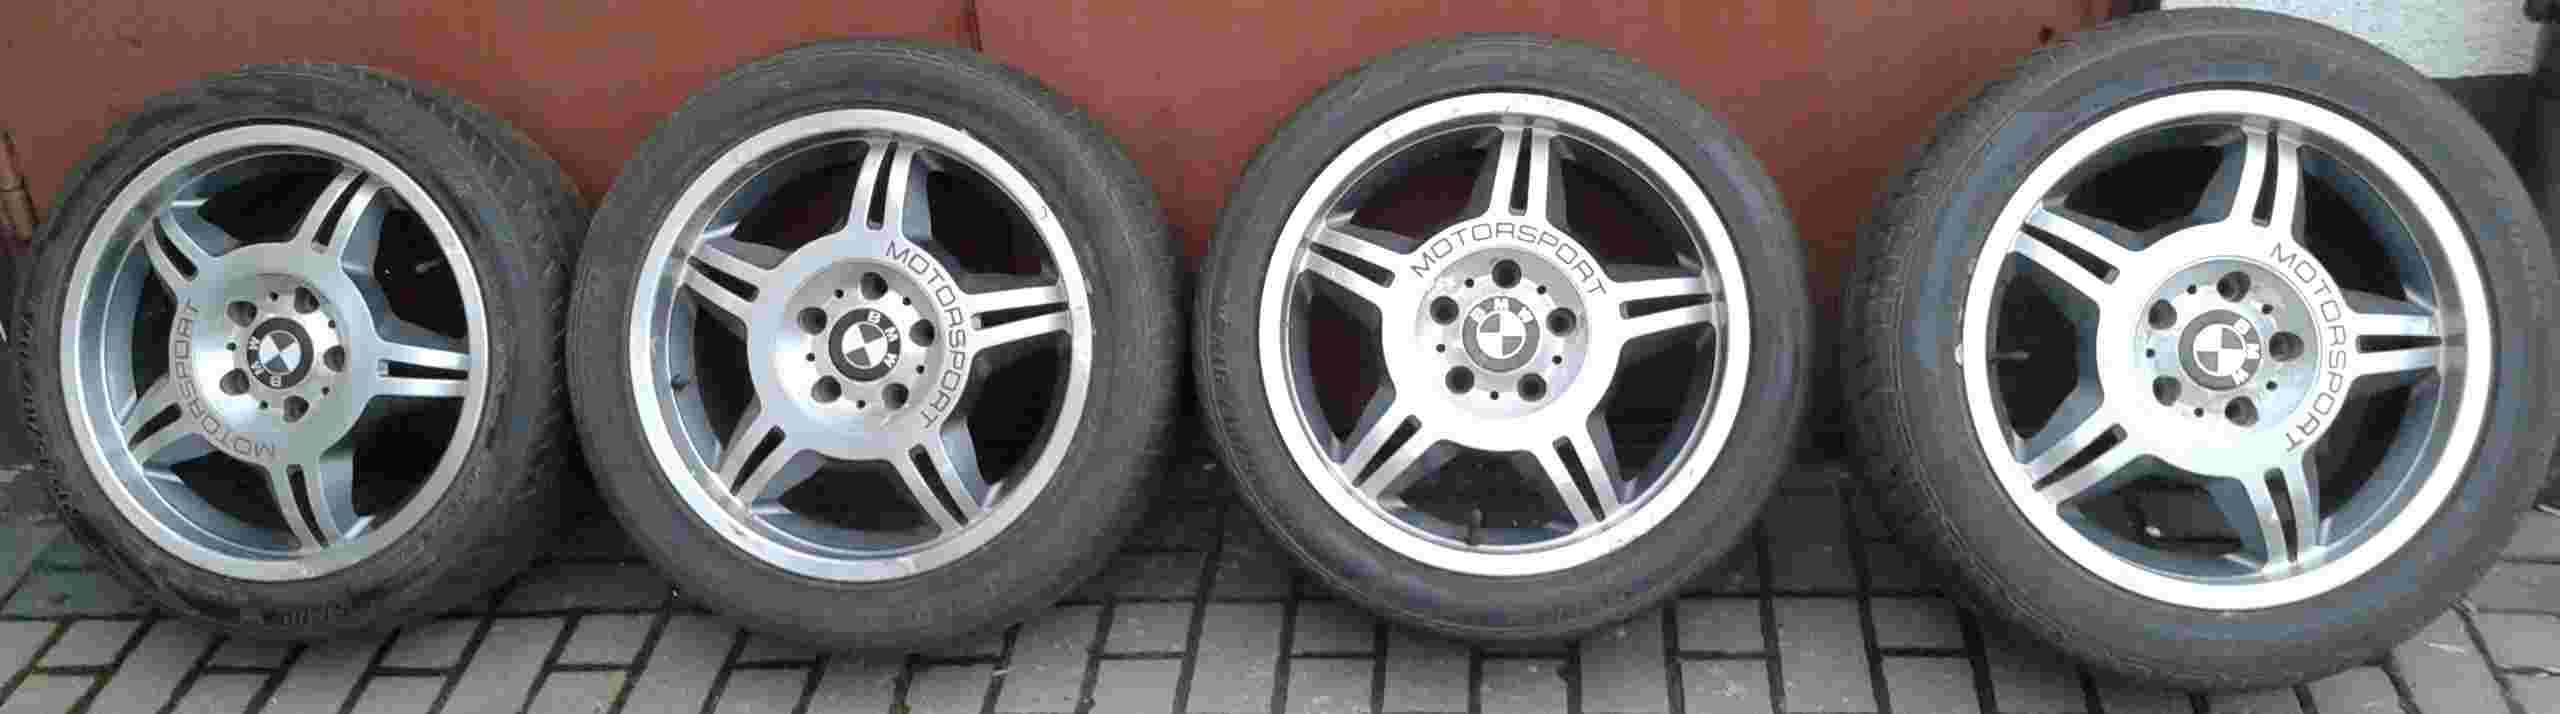 kola BMW cztery sztuki ALU